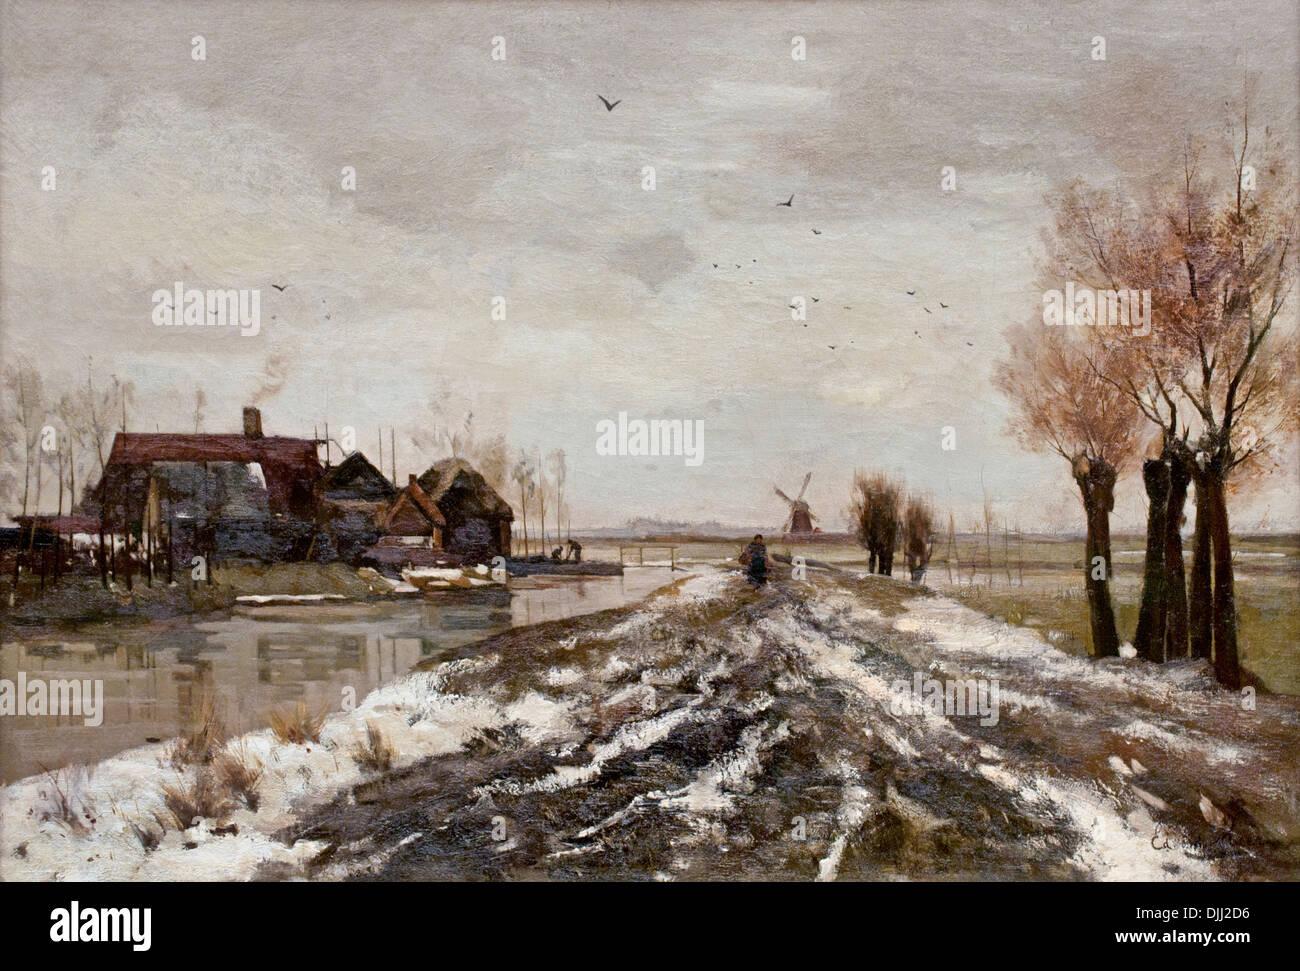 POLDERLANDSCHAFT bei TAUWETTER 1888 EDUARD ALPHONSE VICTOR VAN DER MEER (1846-1889) Niederlande Niederlande Stockbild